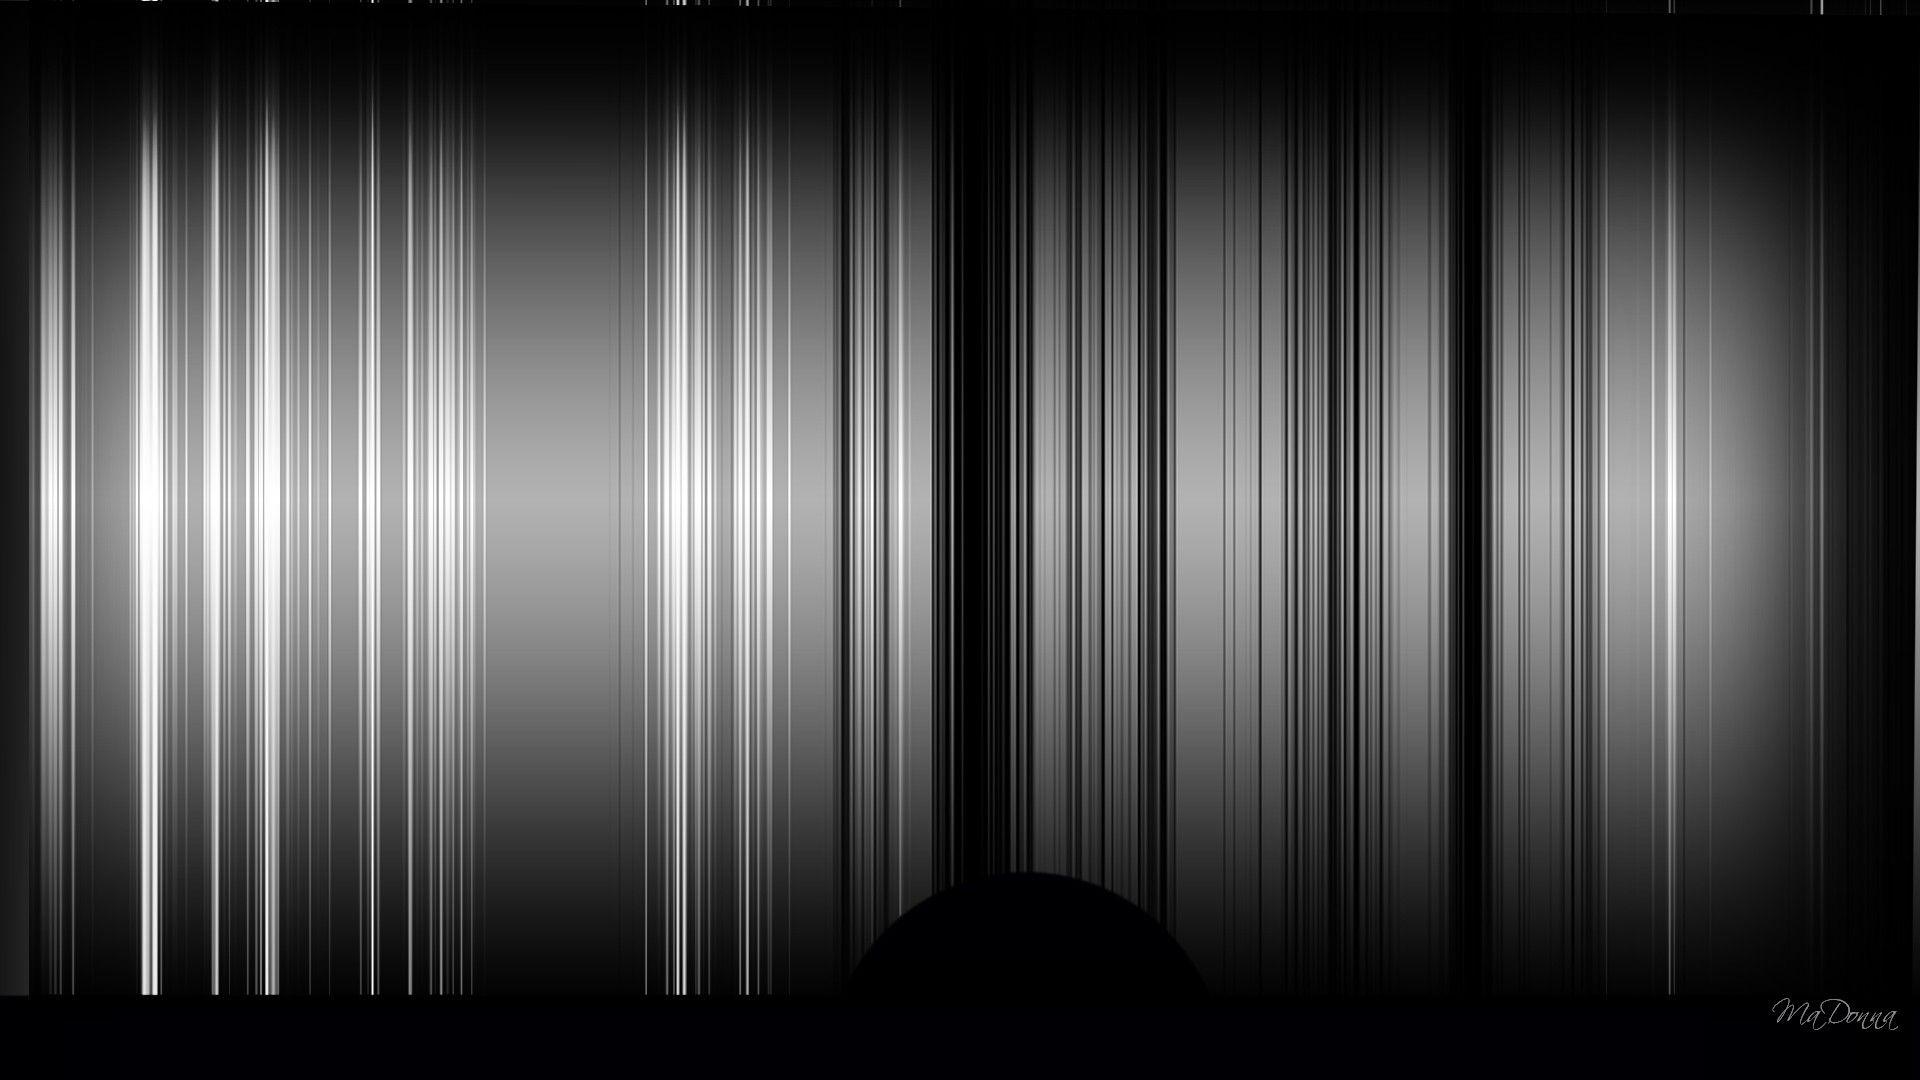 tuxedo wallpapers wallpapers | hd wallpapers | pinterest | tuxedo